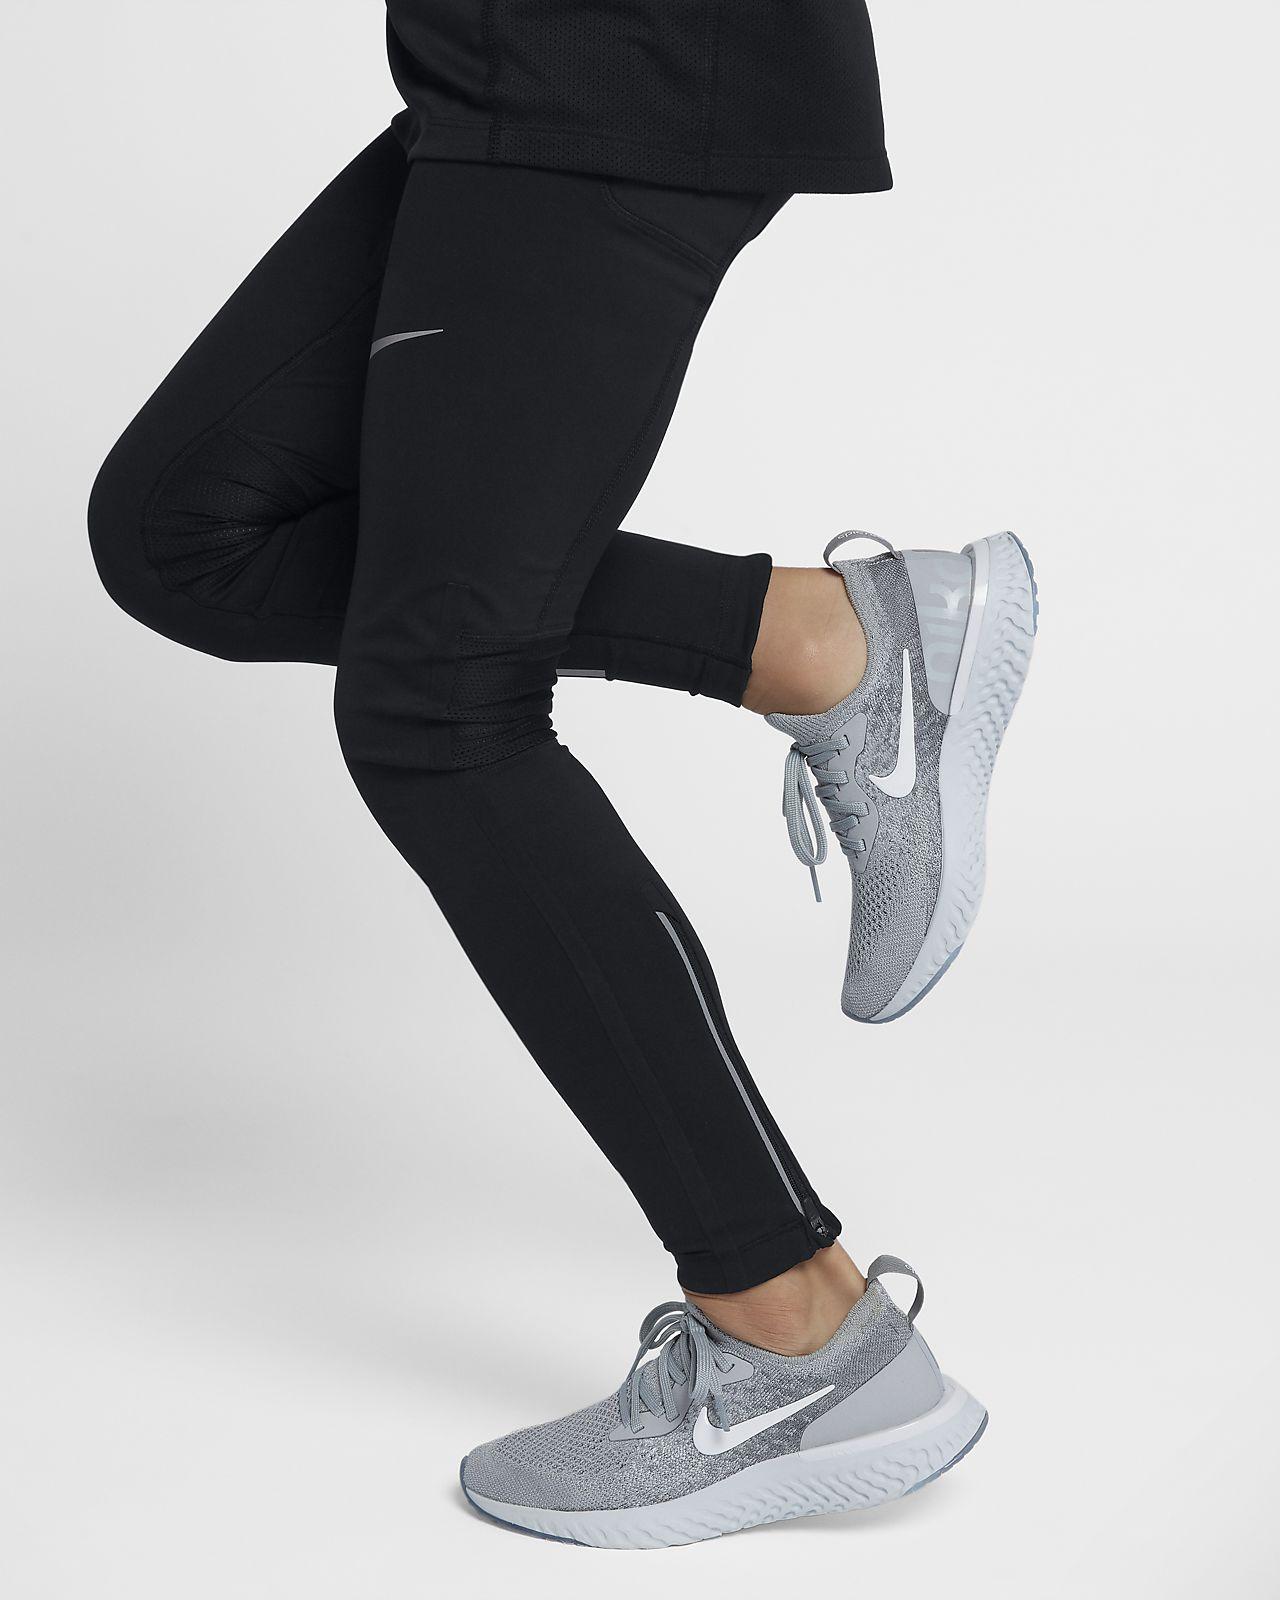 Nike Epic React Flyknit 1 Zapatillas de running Niñoa